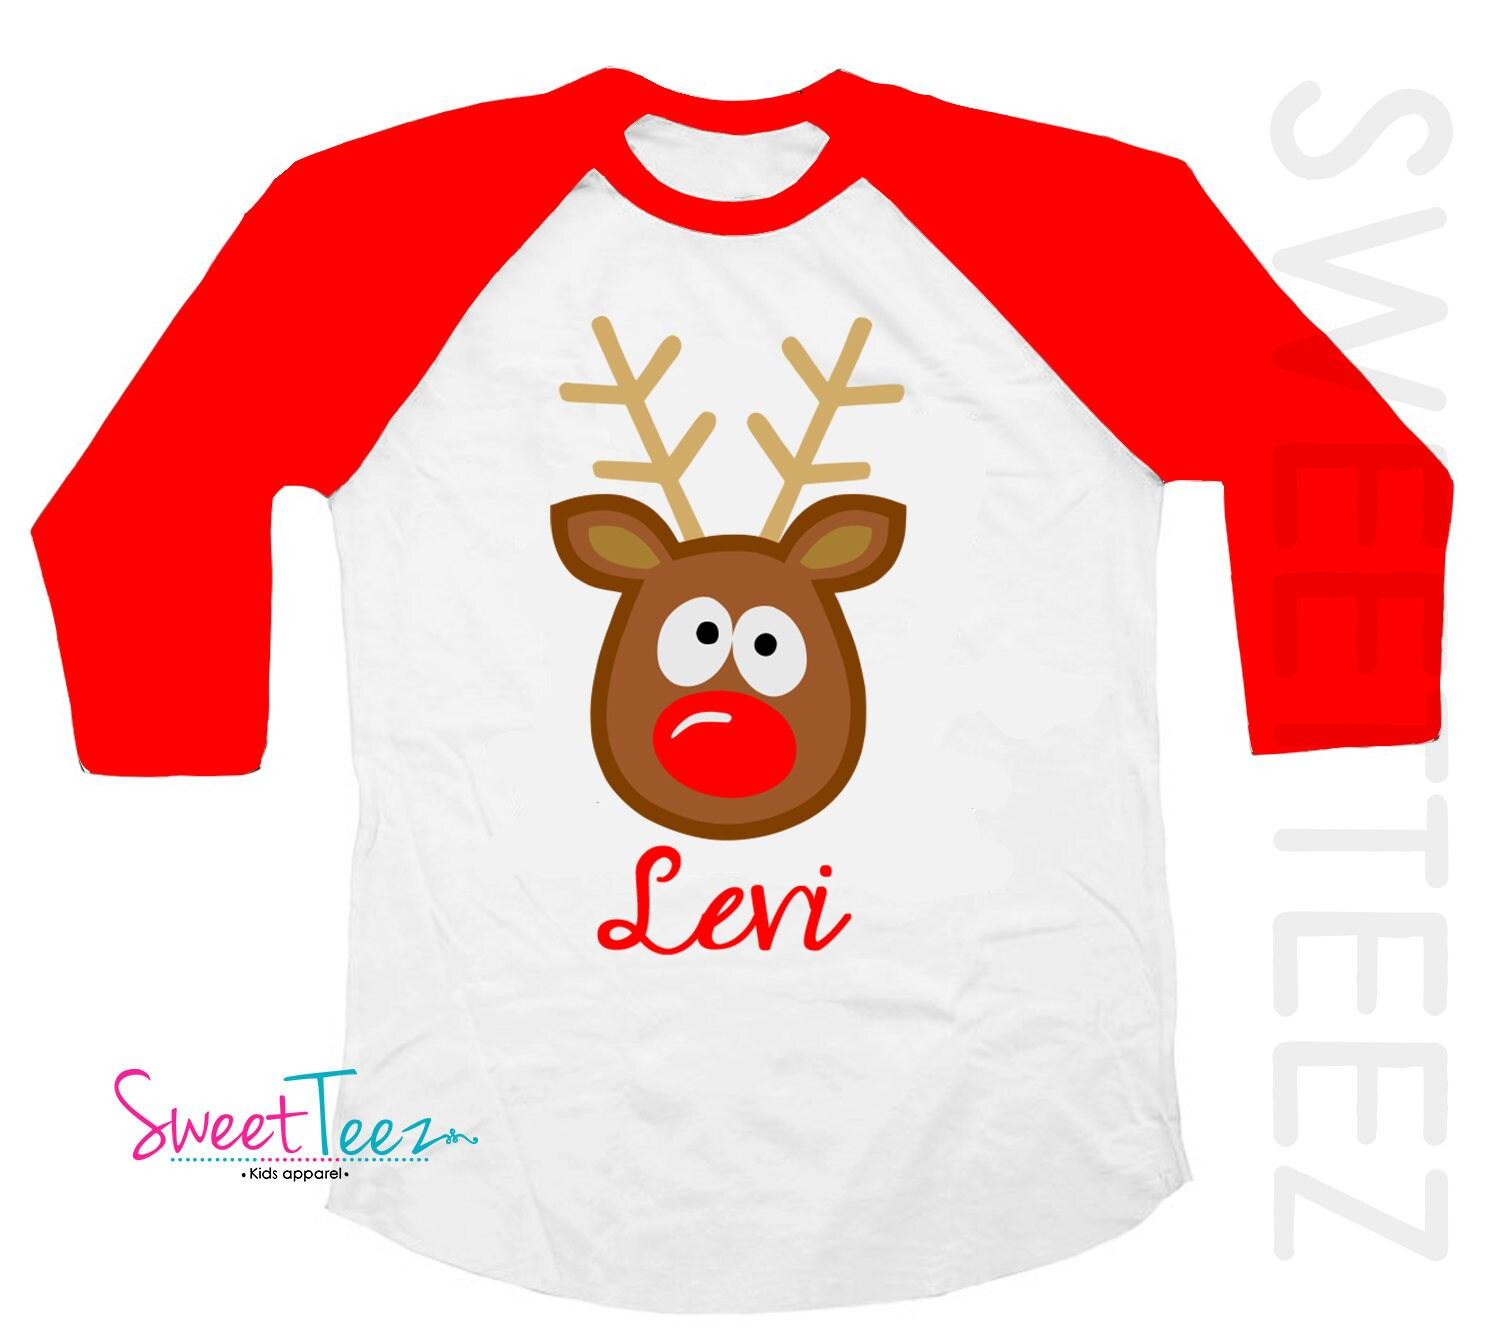 Christmas Shirts Kids Kids Christmas Shirt Personalized   Etsy